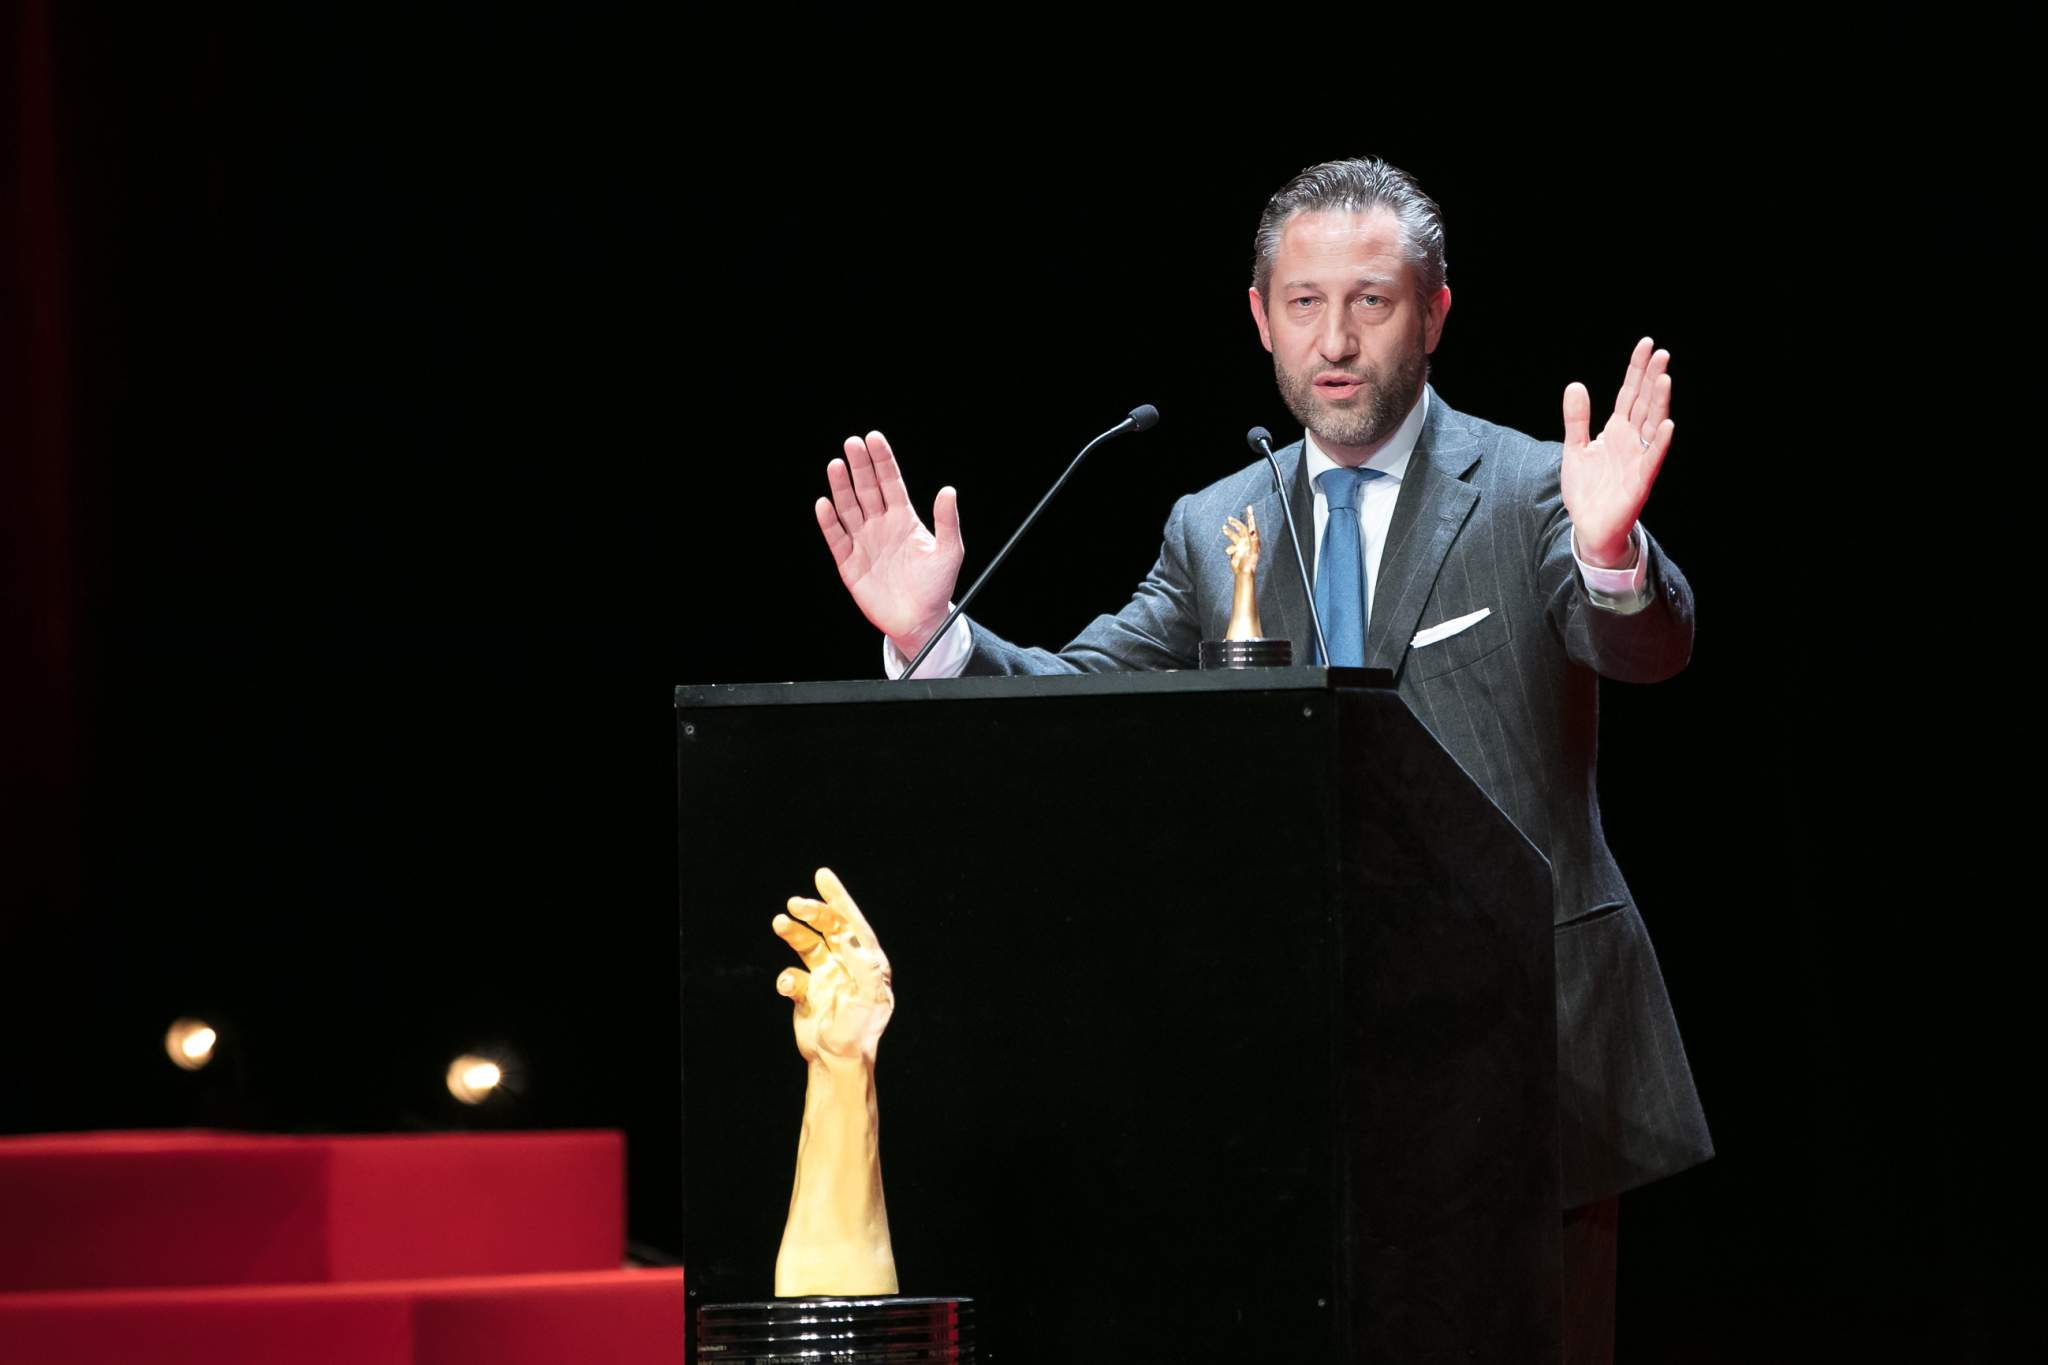 Aurel Bacs (President of the jury of the GPHG 2017)